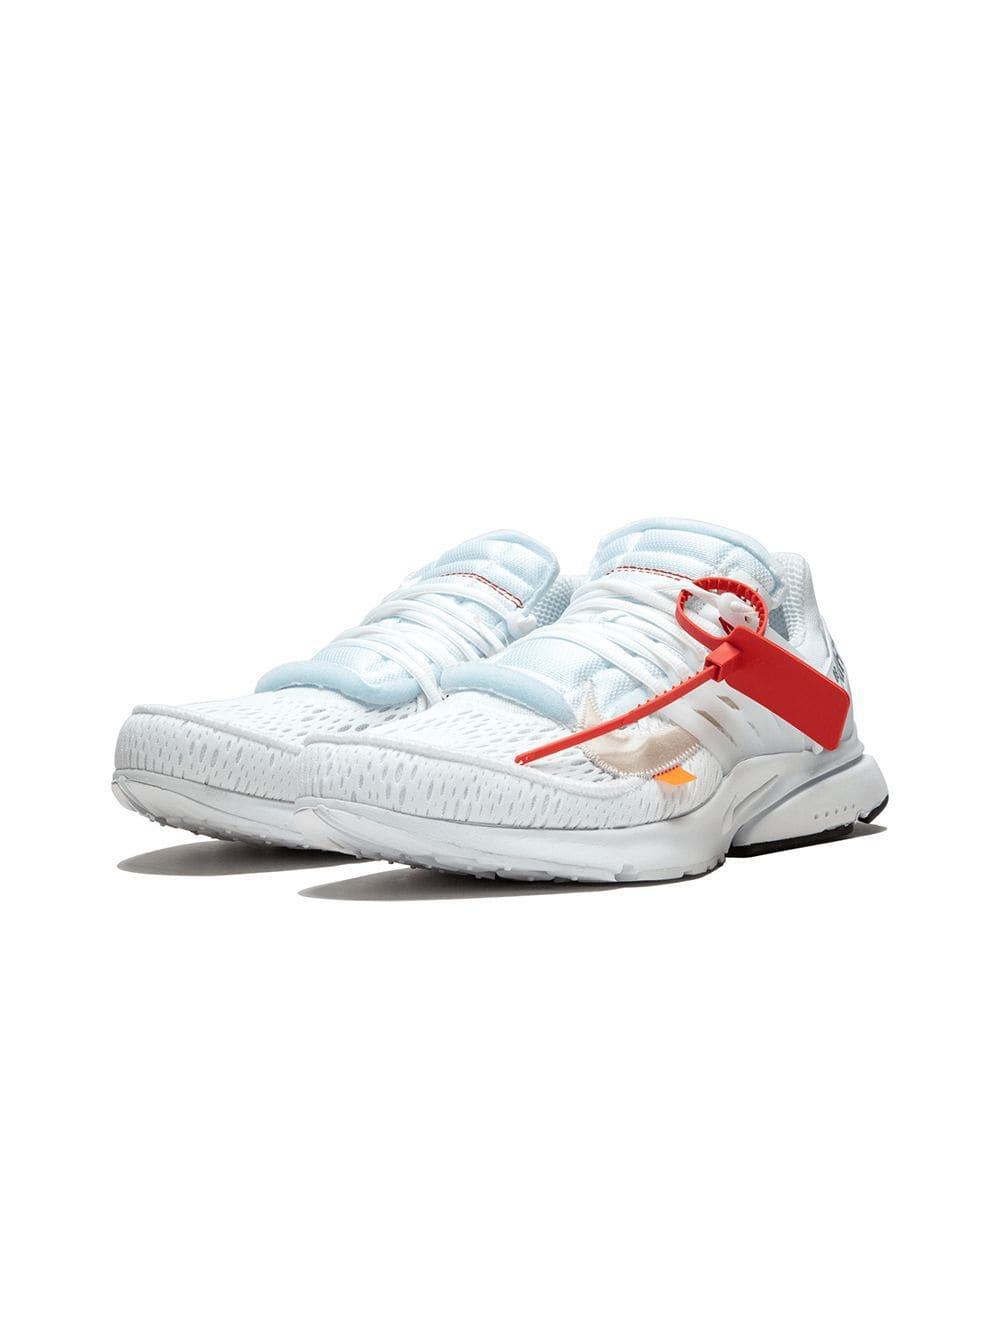 f1239aeb2 Lyst - Nike X Off-white The 10   Air Presto Sneakers in White for Men